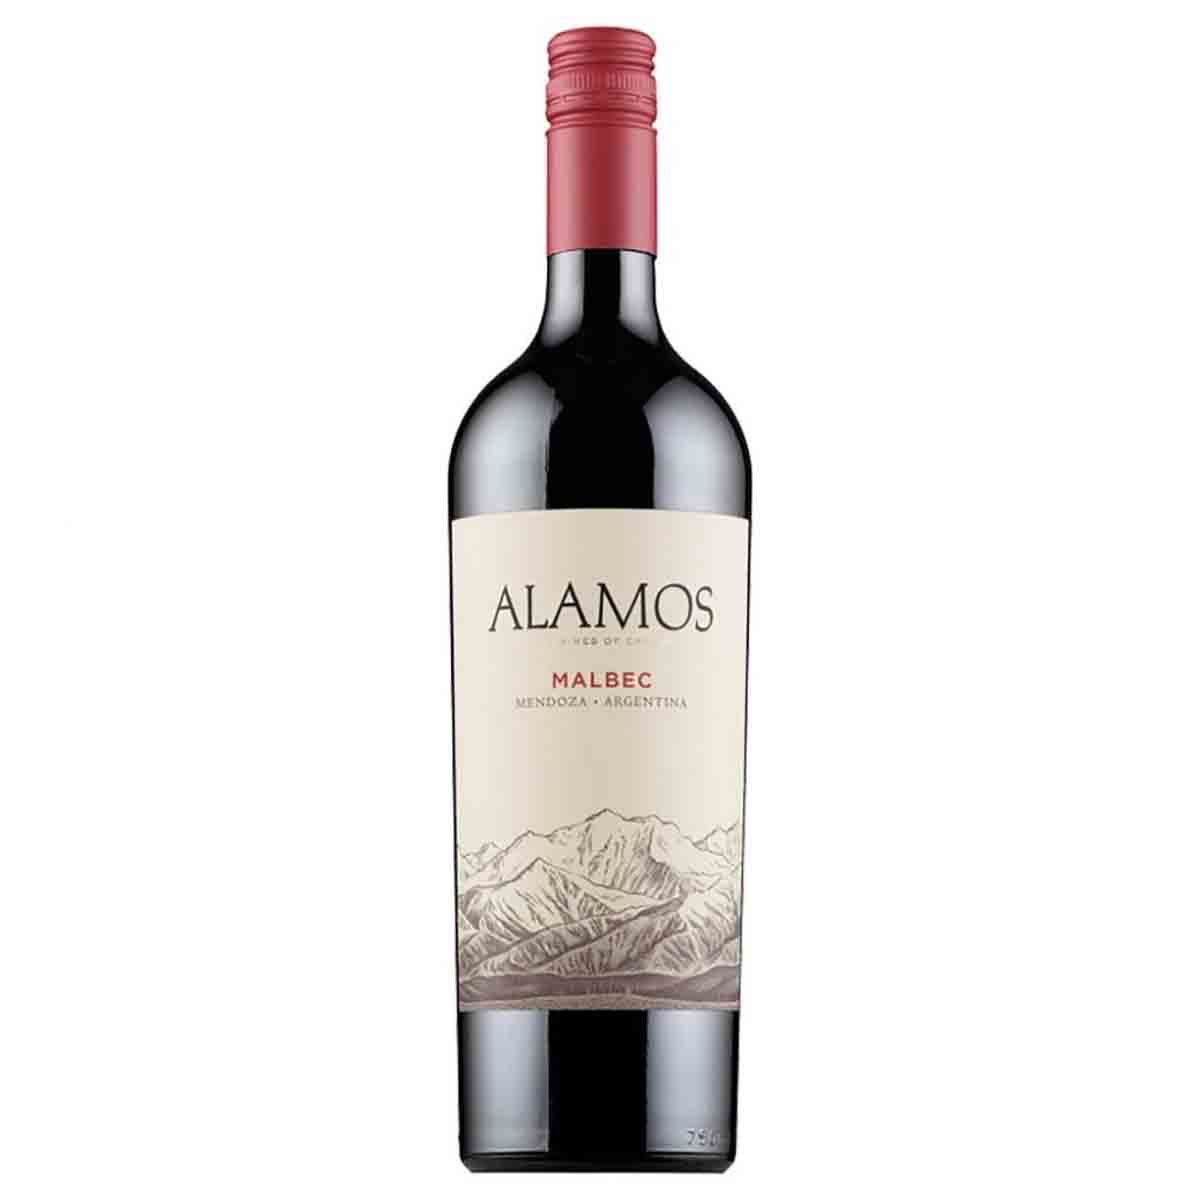 Vinho Tinto Argentino Alamos Malbec 2018 Catena Zapata